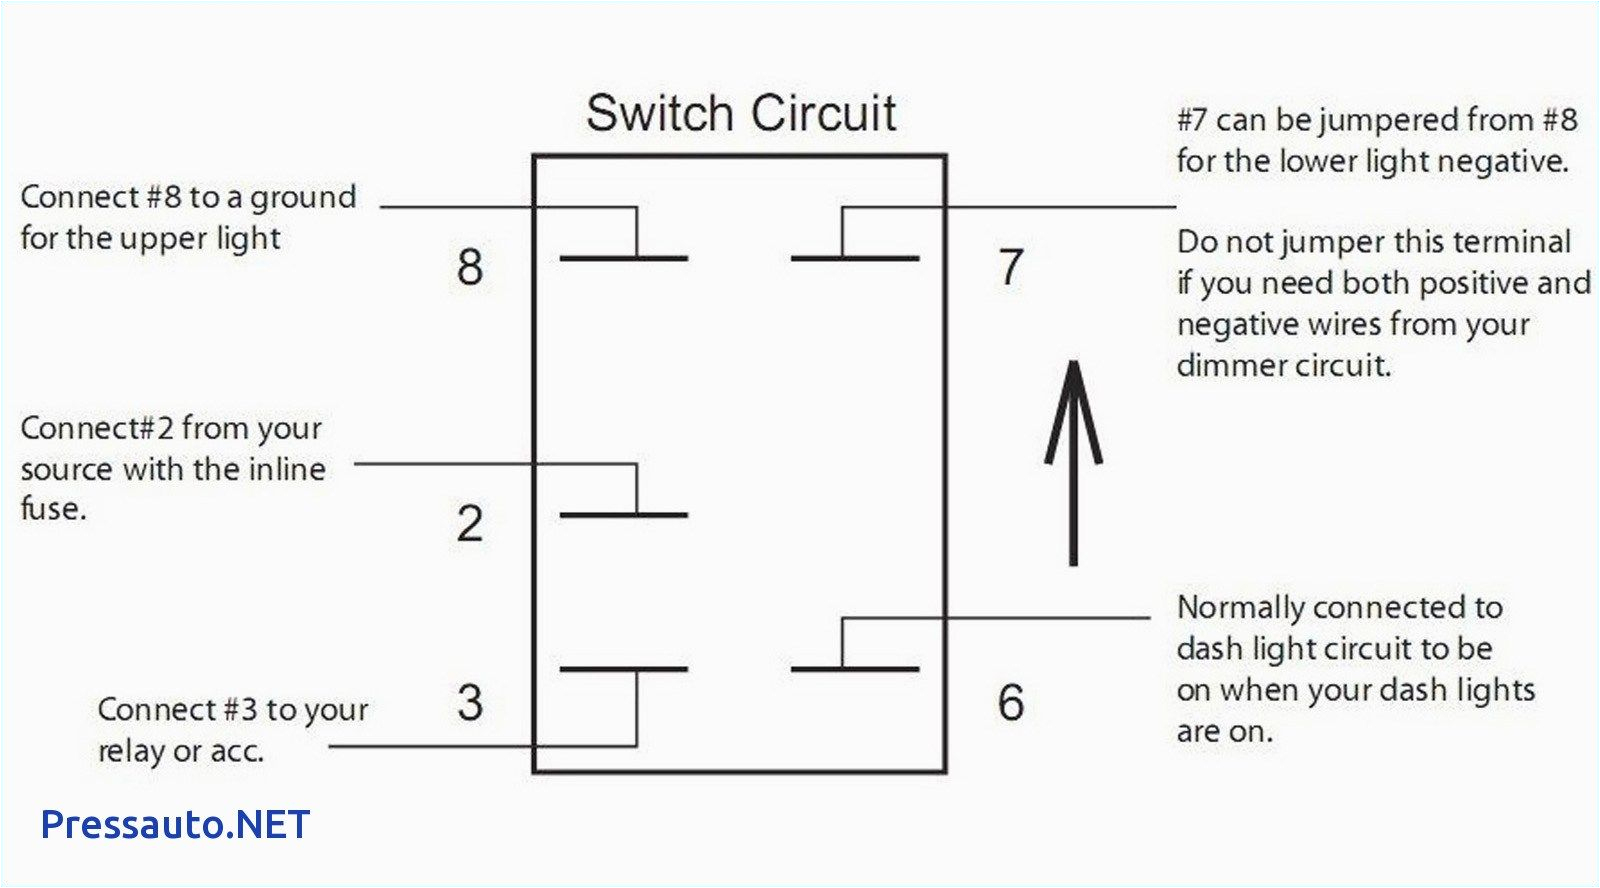 120v Illuminated Rocker Switch Wiring Diagram Ov 6125 Terminal Lamp Wiring Diagram 3 Circuit Diagrams